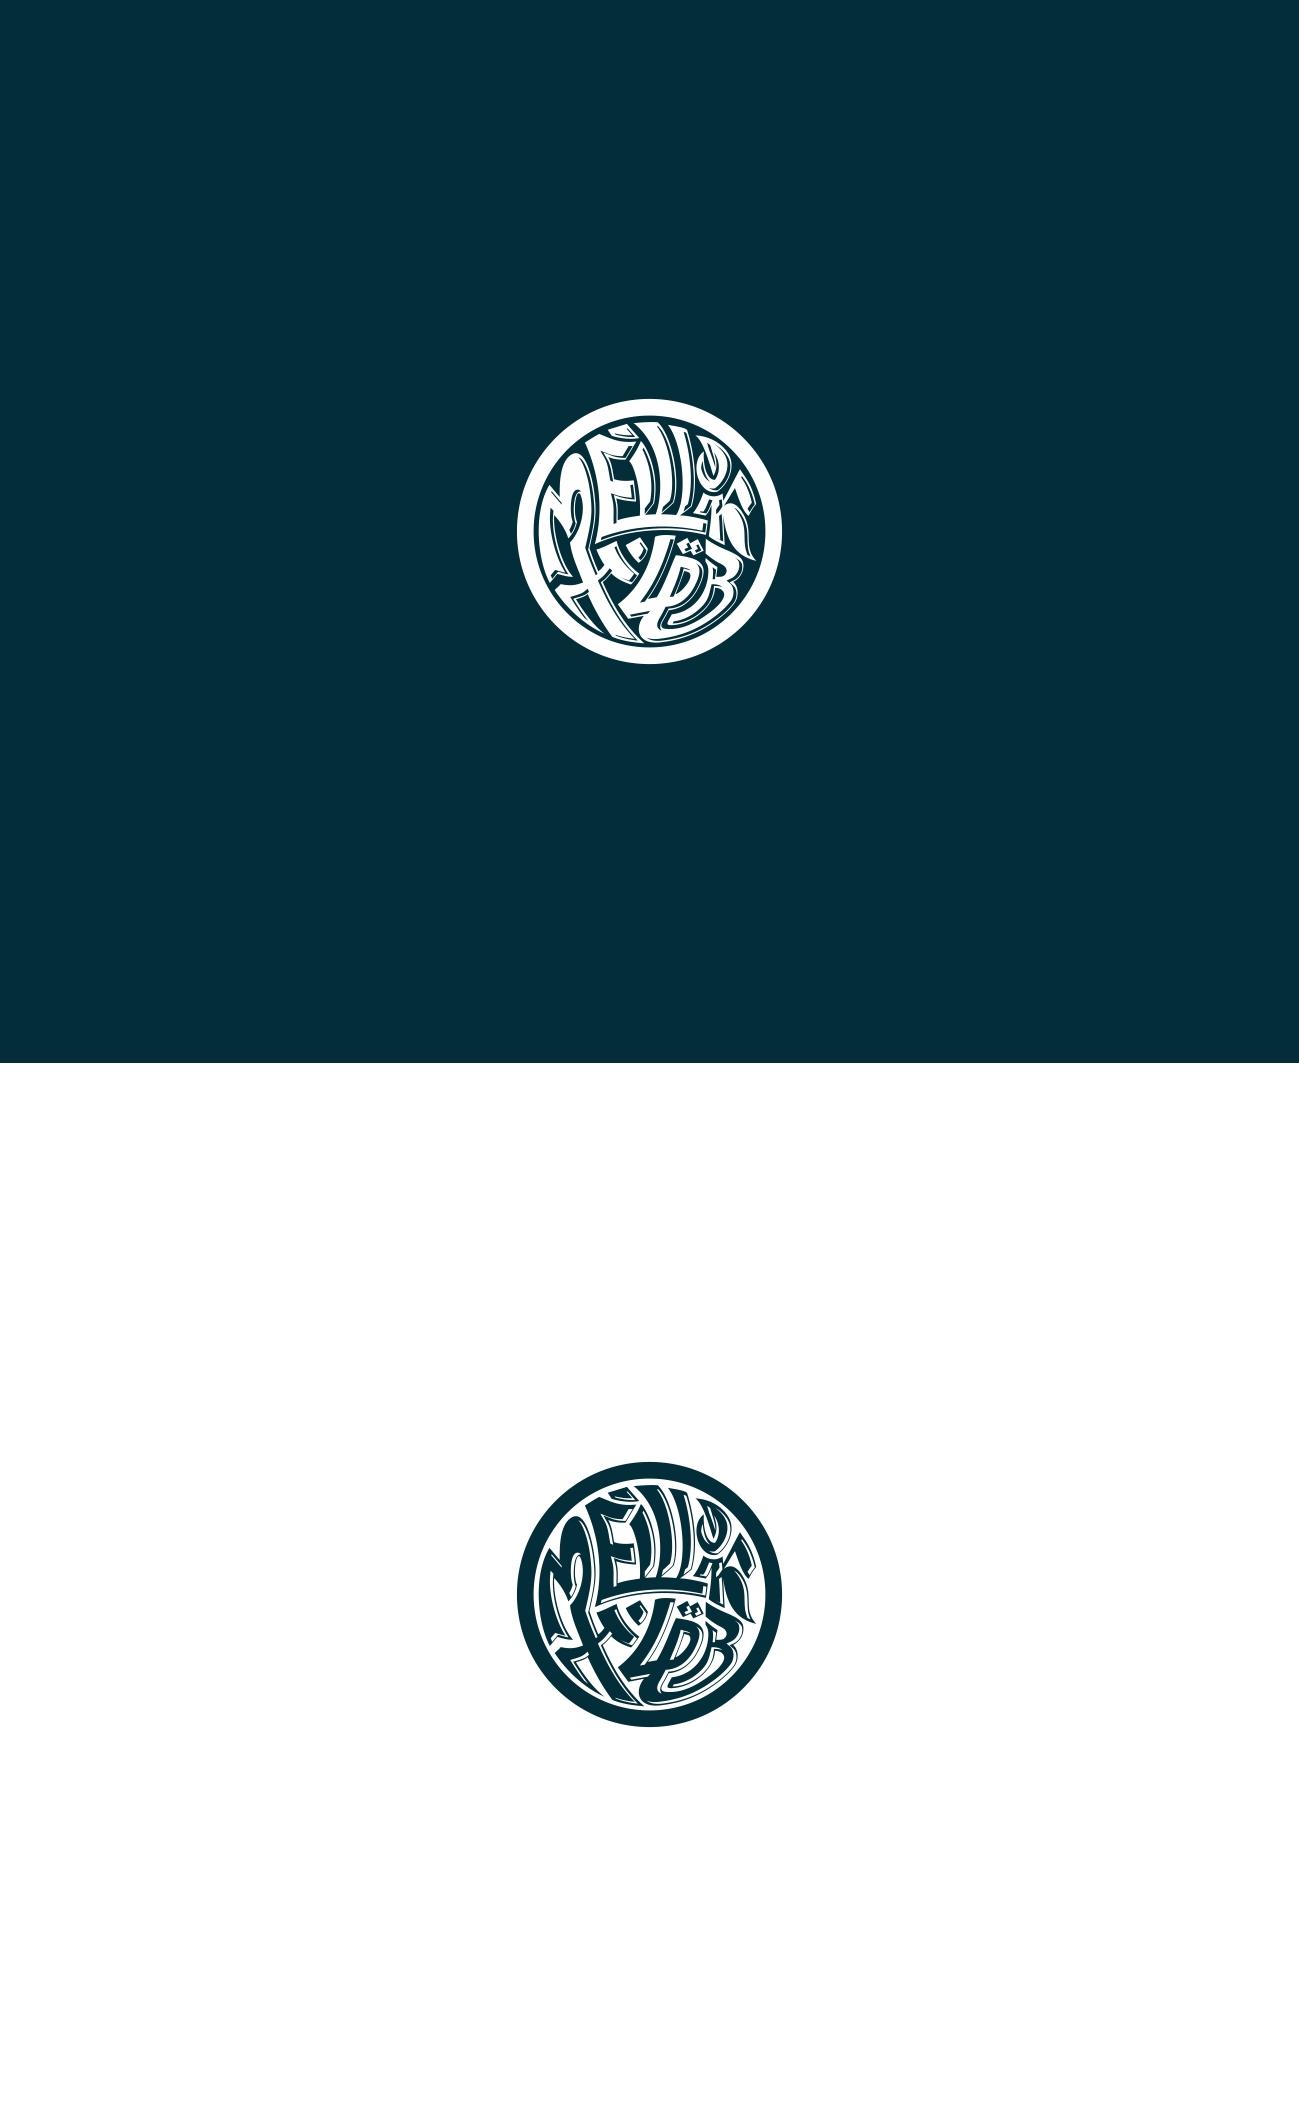 Конкурс! Каллиграфия! Логотип! фото f_1376065b9dcd6240.jpg